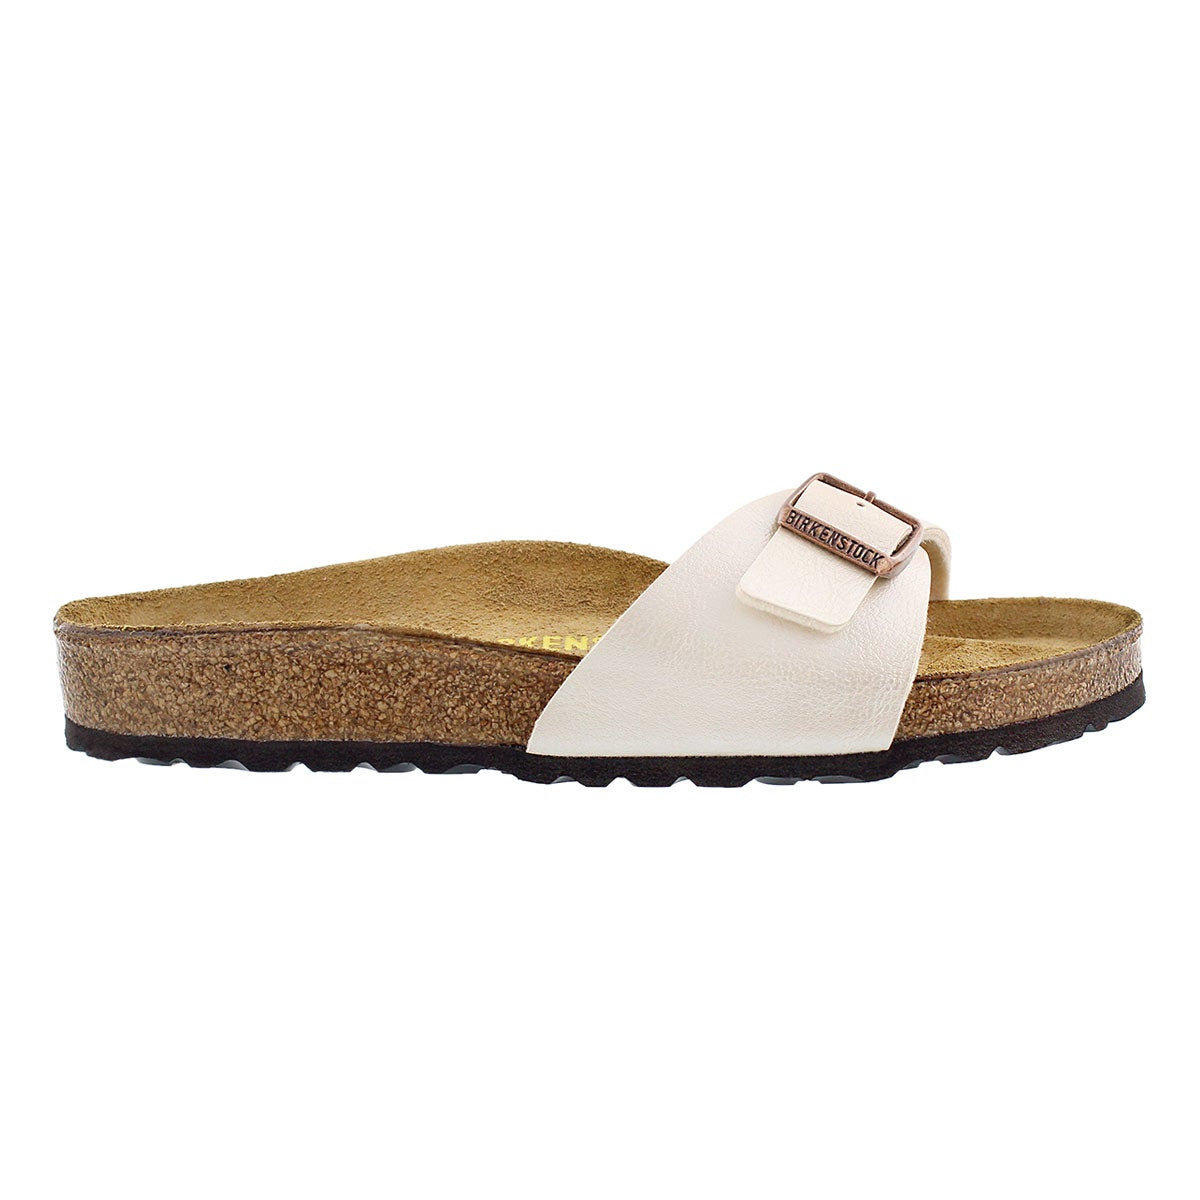 Lds Madrid pearl white BF 1 strap sandal